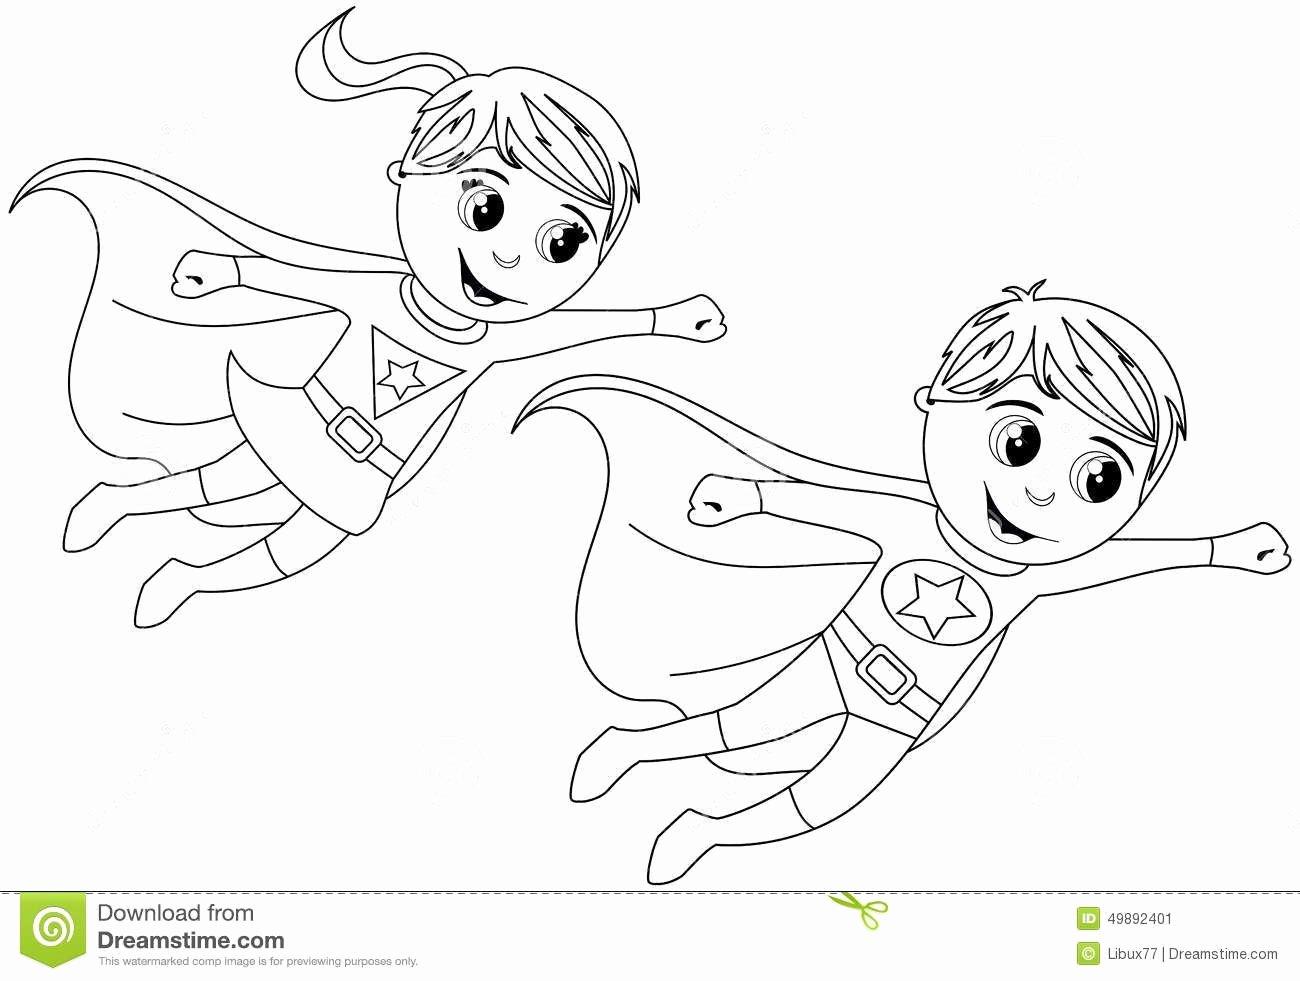 Female Superhero Coloring Pages Luxury Happy Superhero Kid Kids Flying isolated Coloring Page Stock Heros Pinterest